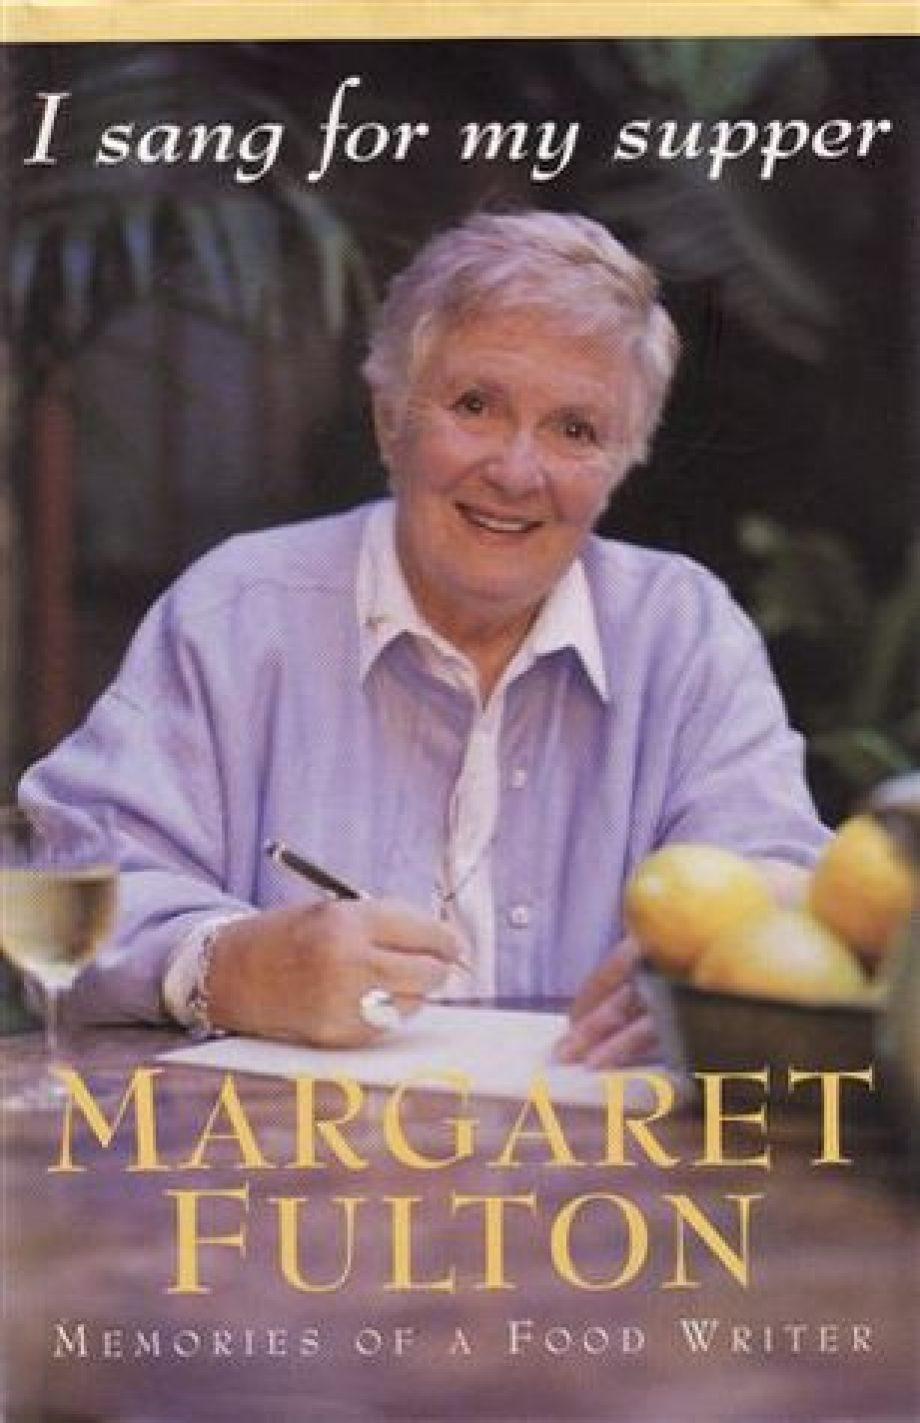 Margaret-Fulton